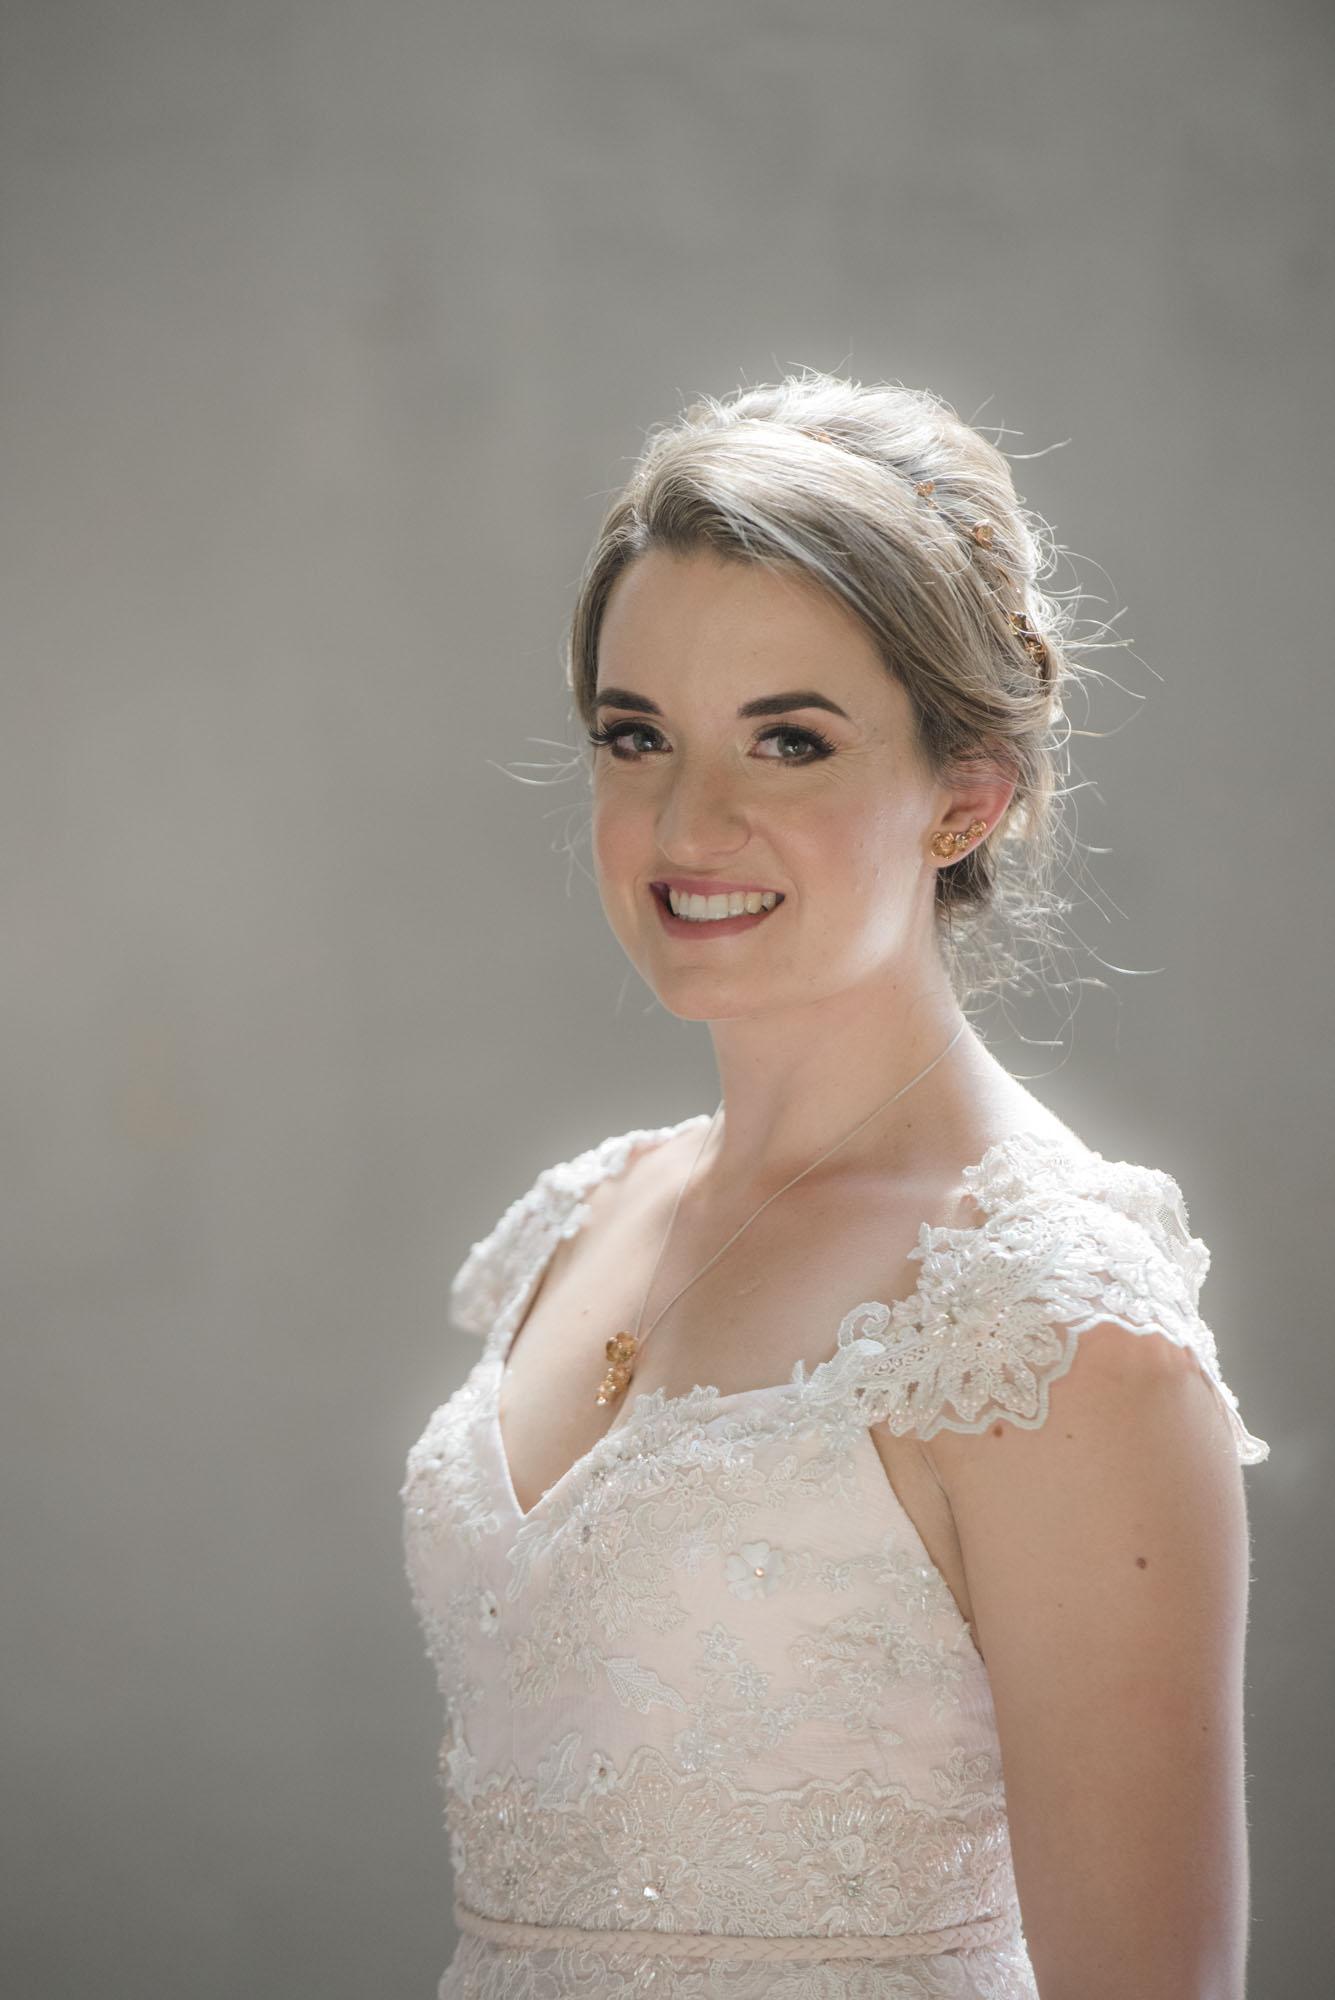 058a-affordable-wedding-photographers-johannesburg058a-affordable-wedding-photographers-johannesburg_a.jpg